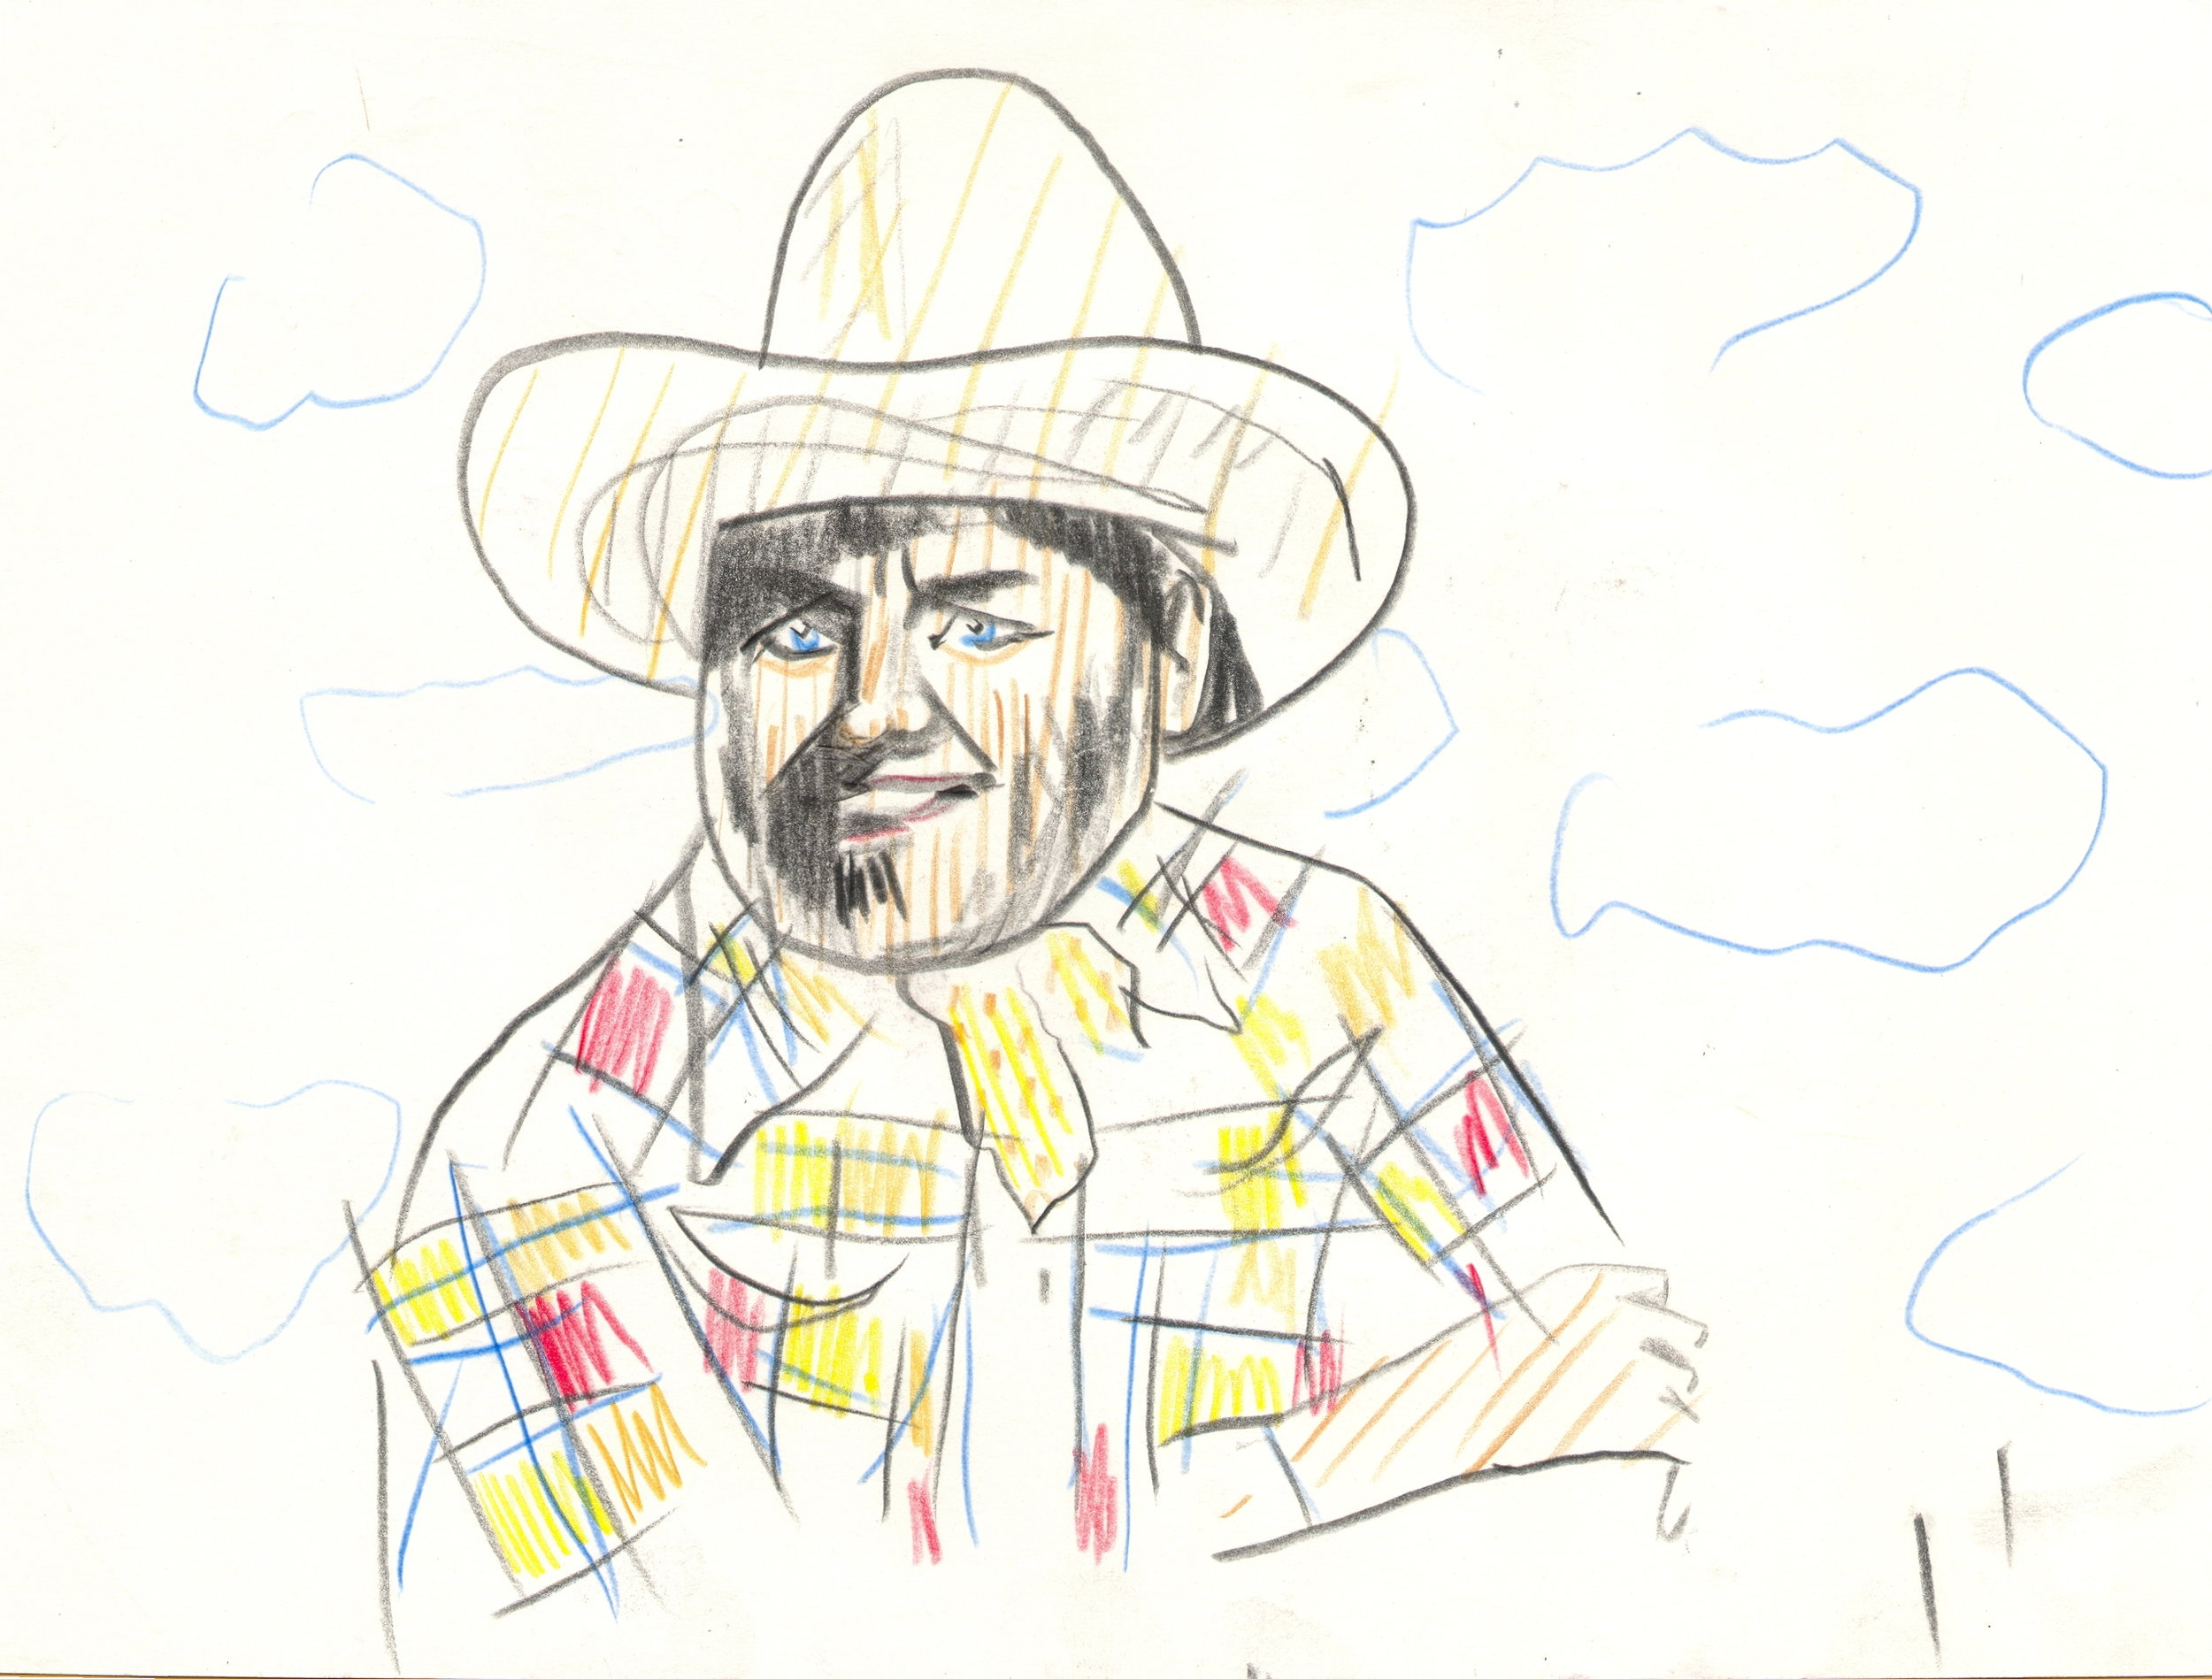 O.T. ( Serie Cowboys II ), 2016  Bleistift auf Papier, 26x35.5cm